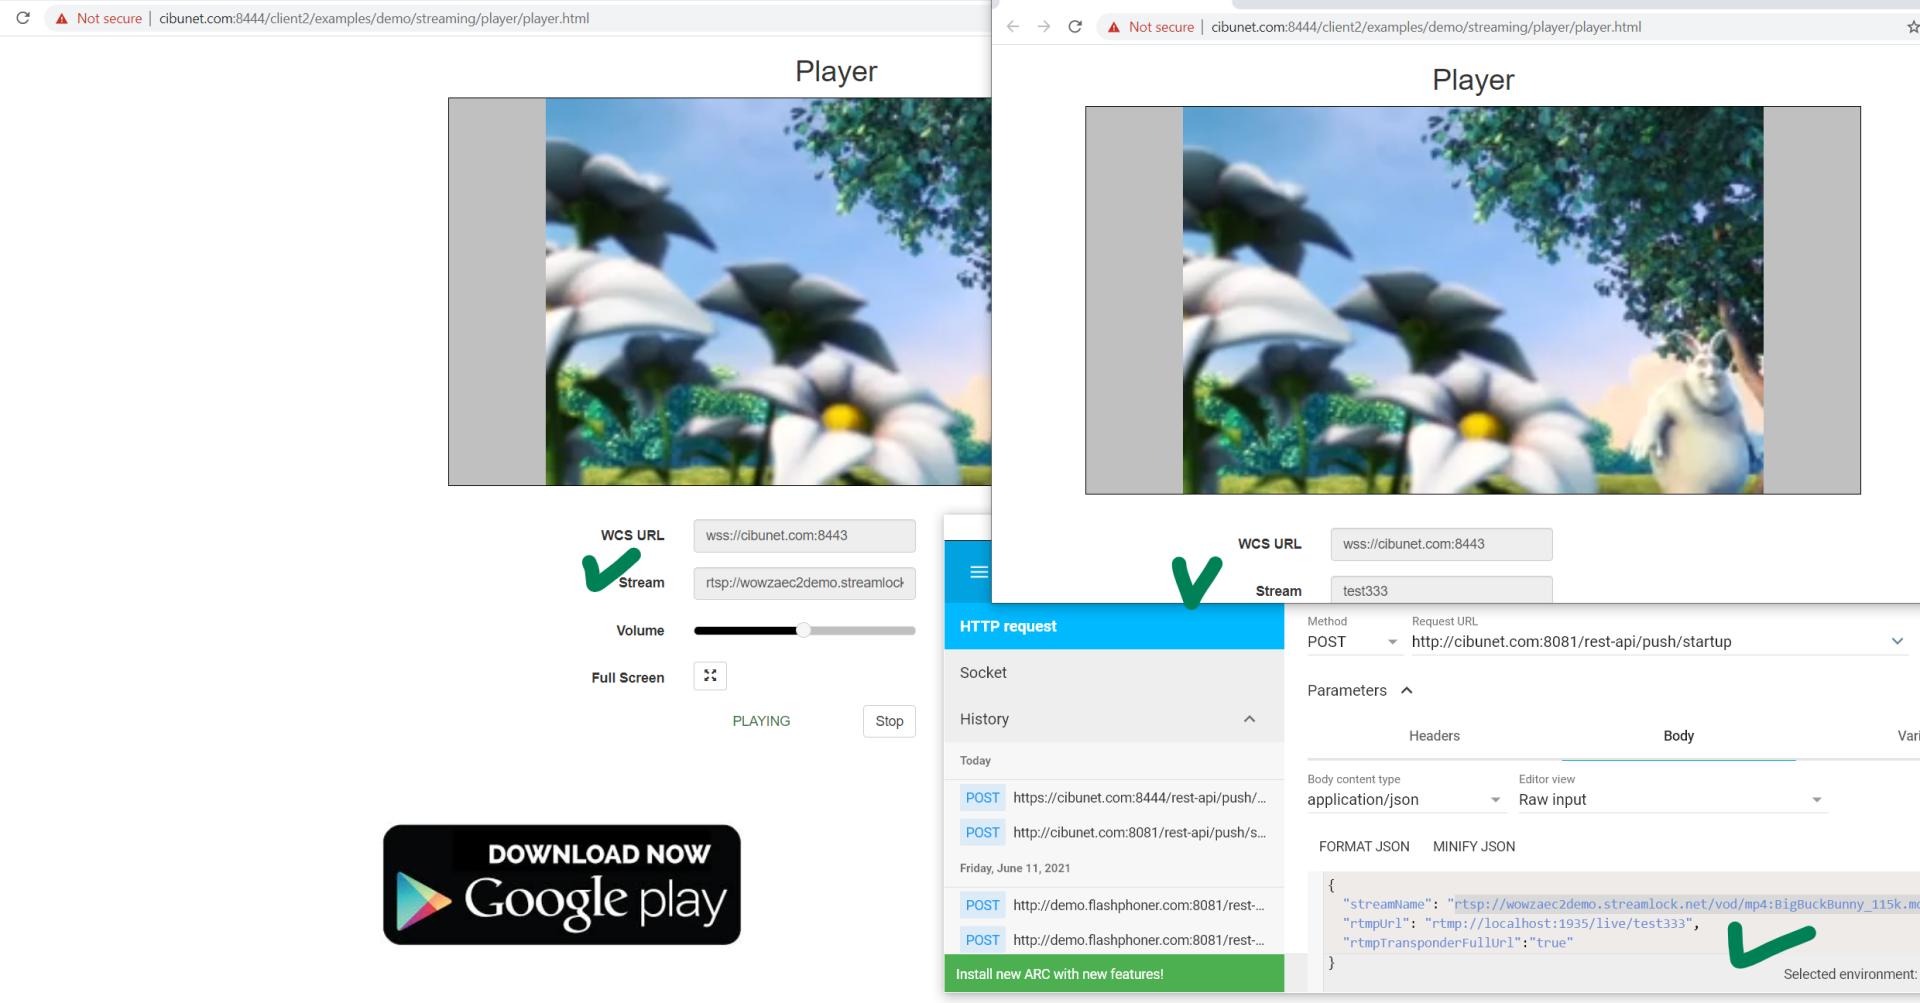 rtsp-rtmp-localhost-webrtc-play.png